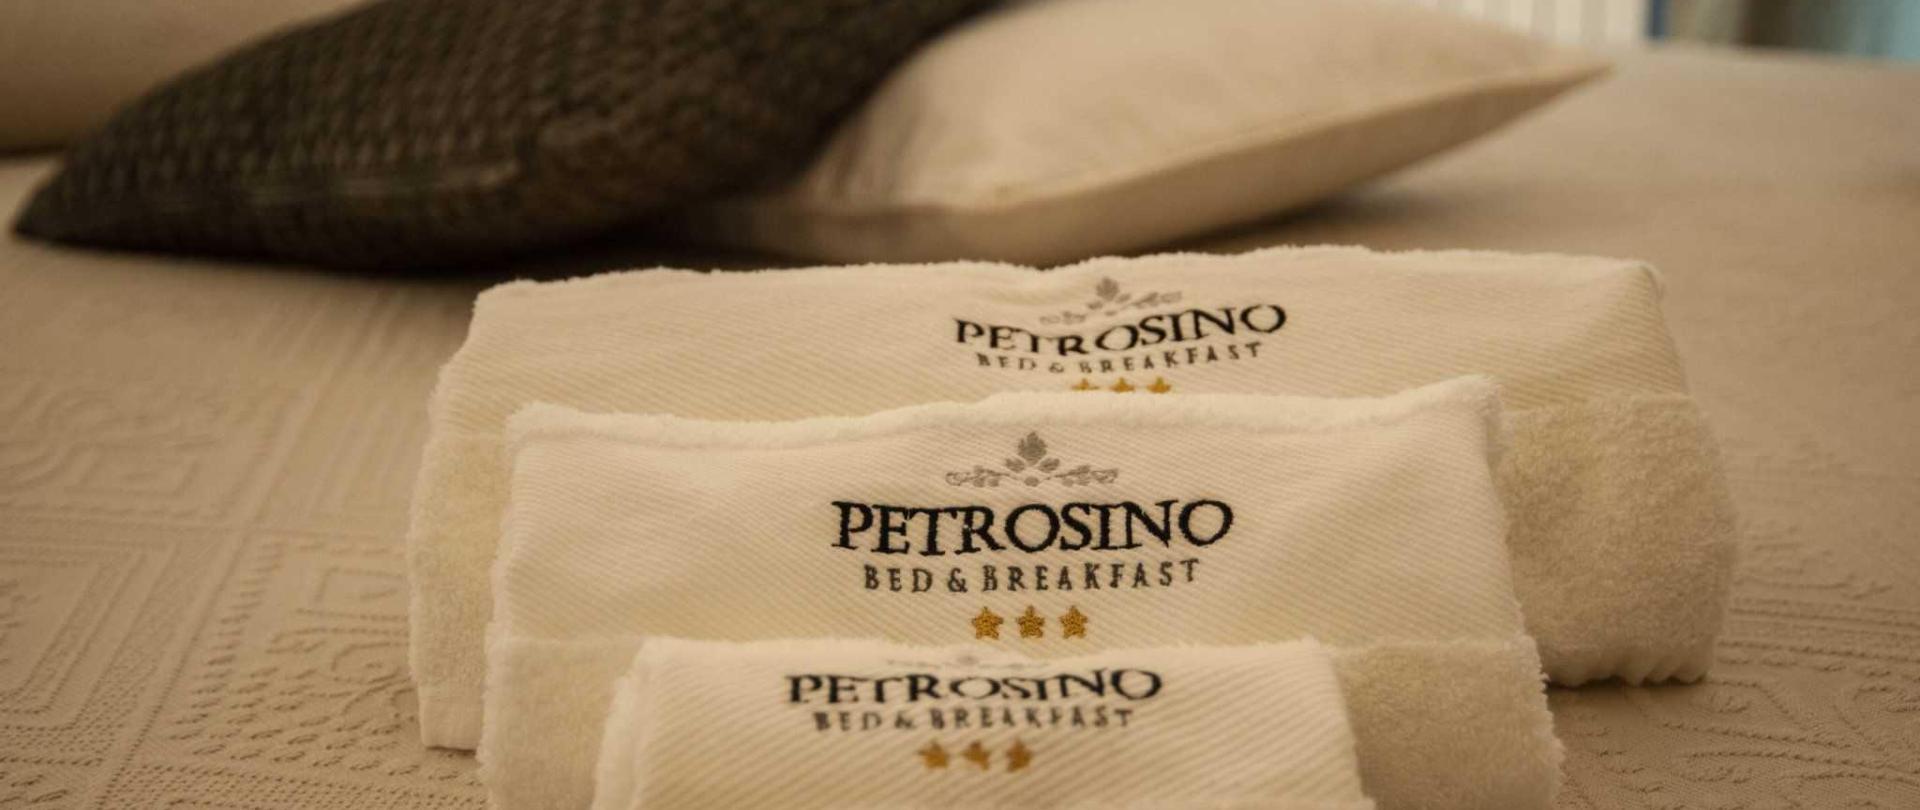 ph-sergio-fiorito-b-b-petrosino-1503-1.jpg